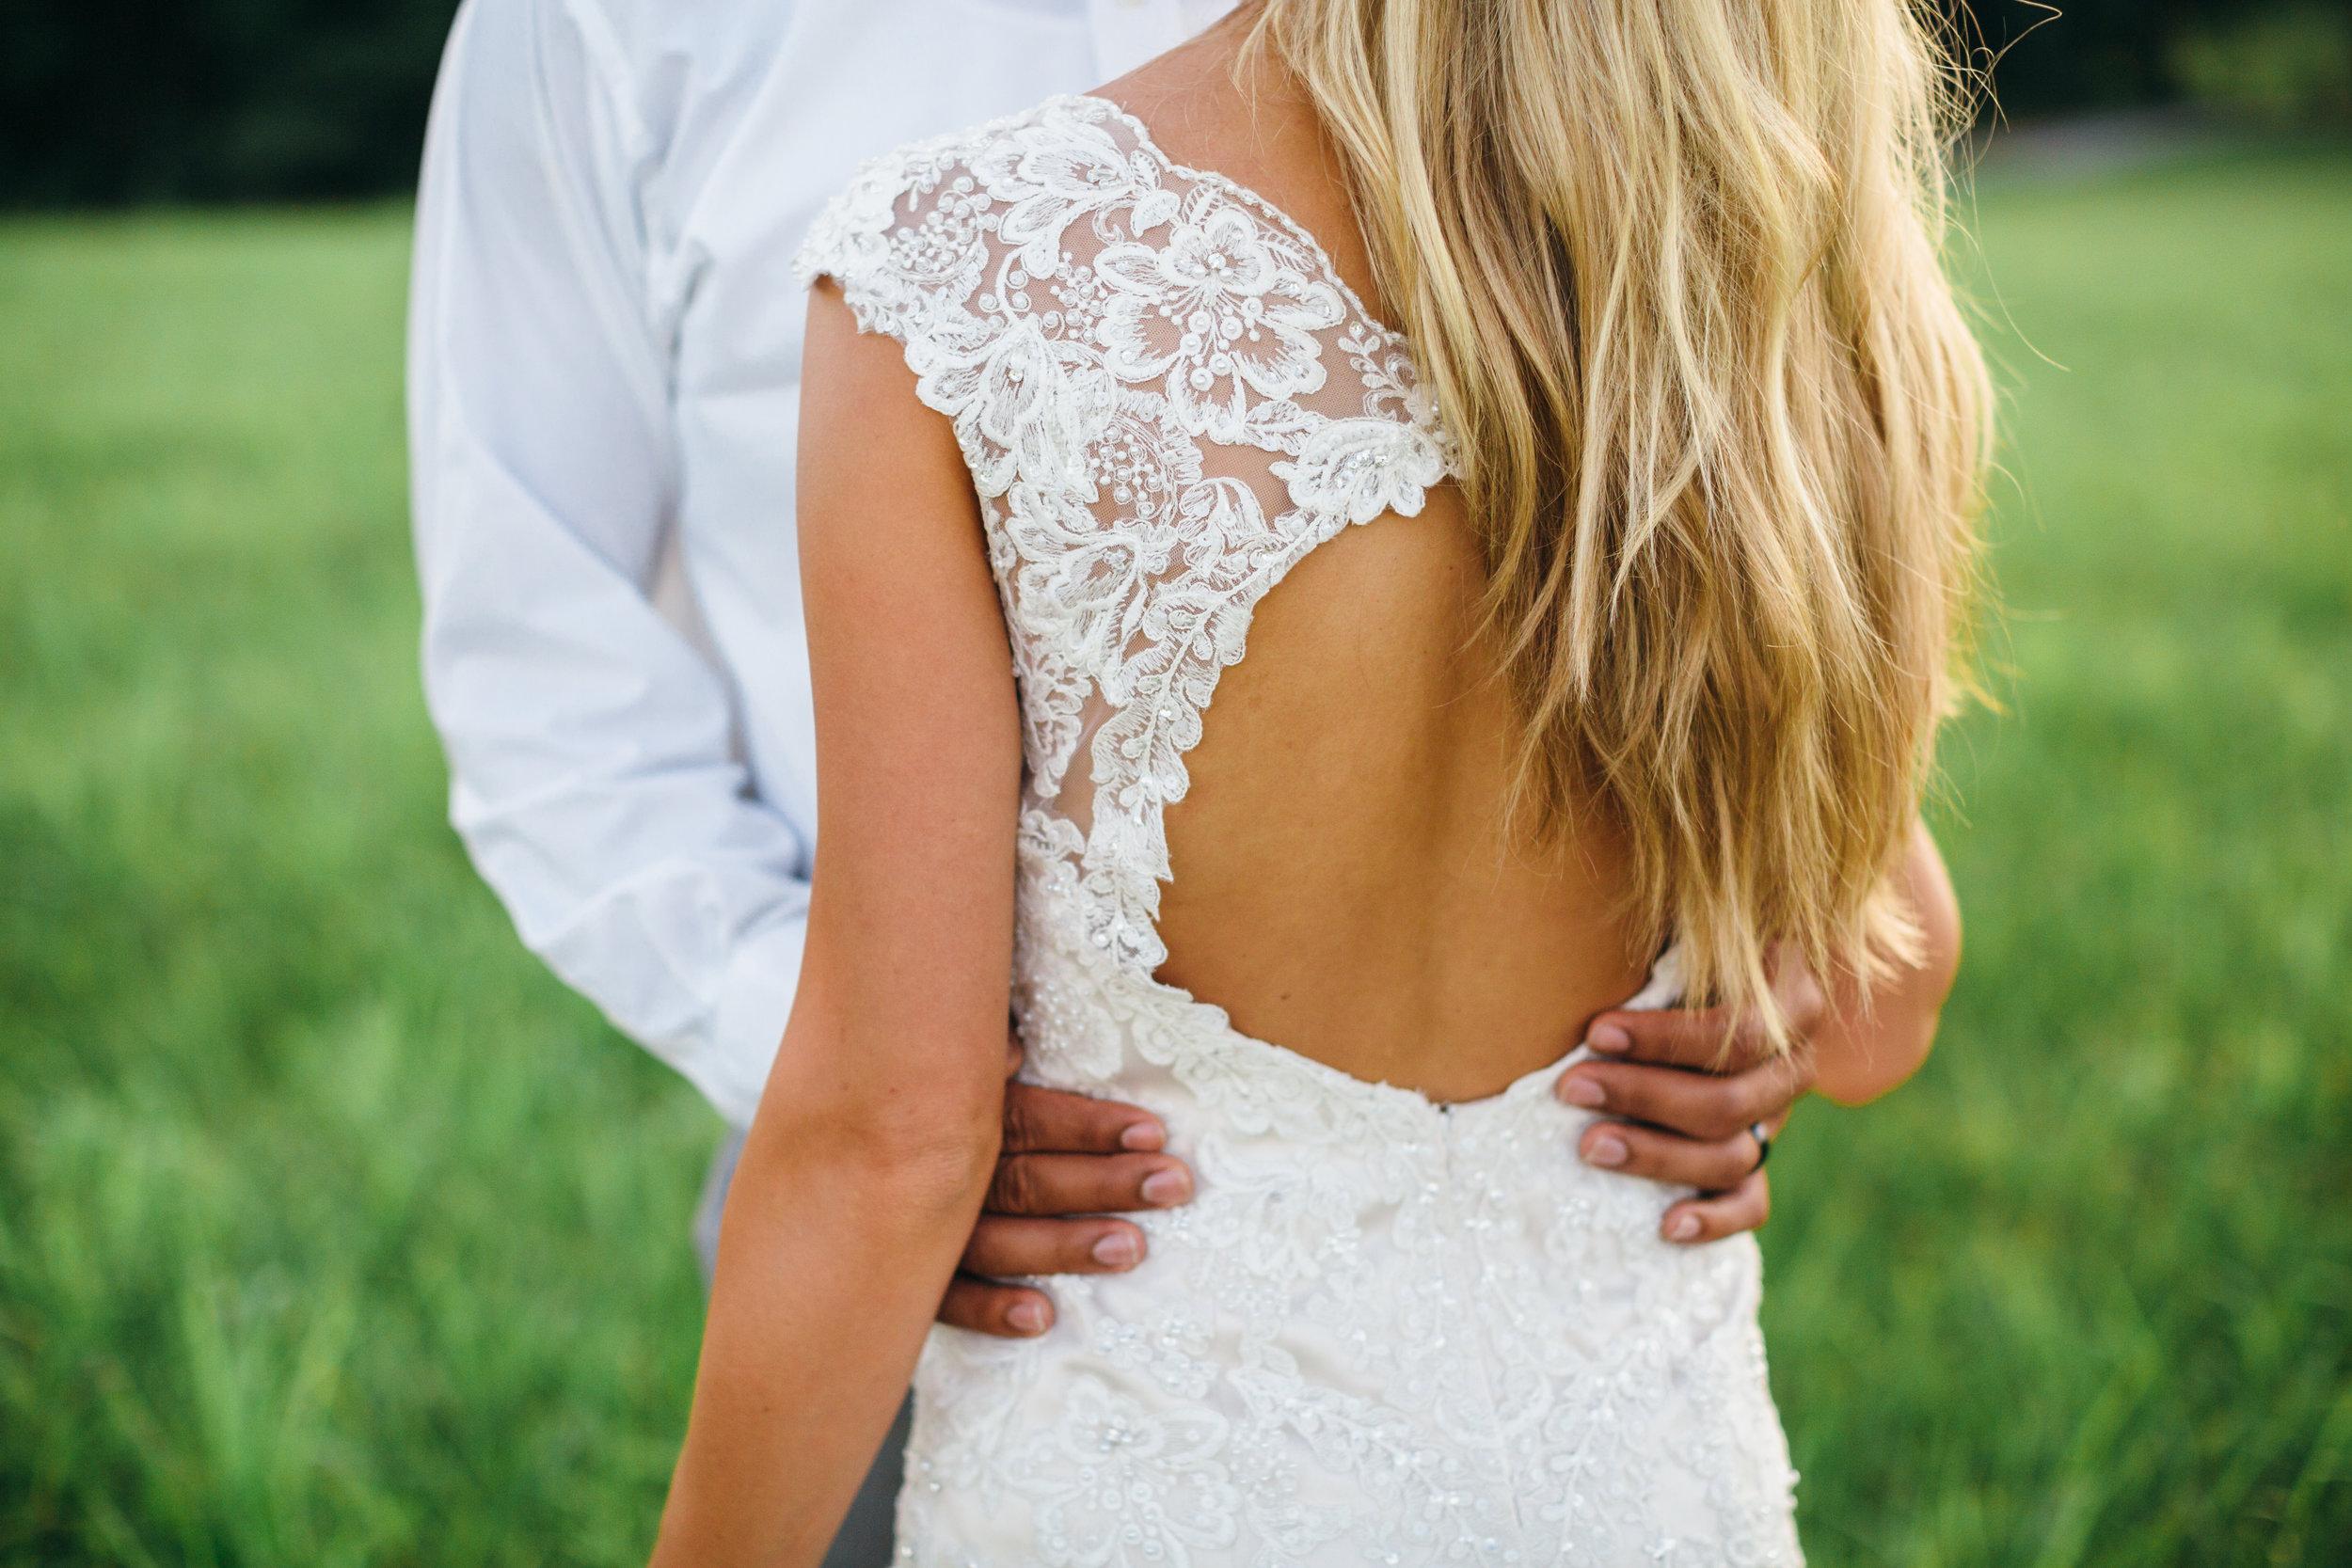 Lynchburg Wedding Photographer; Lynchburg Photographer; Lynchburg Wedding; Sorella Farms Wedding; Virginia Wedding Photographer; Virginia Wedding-24.jpg